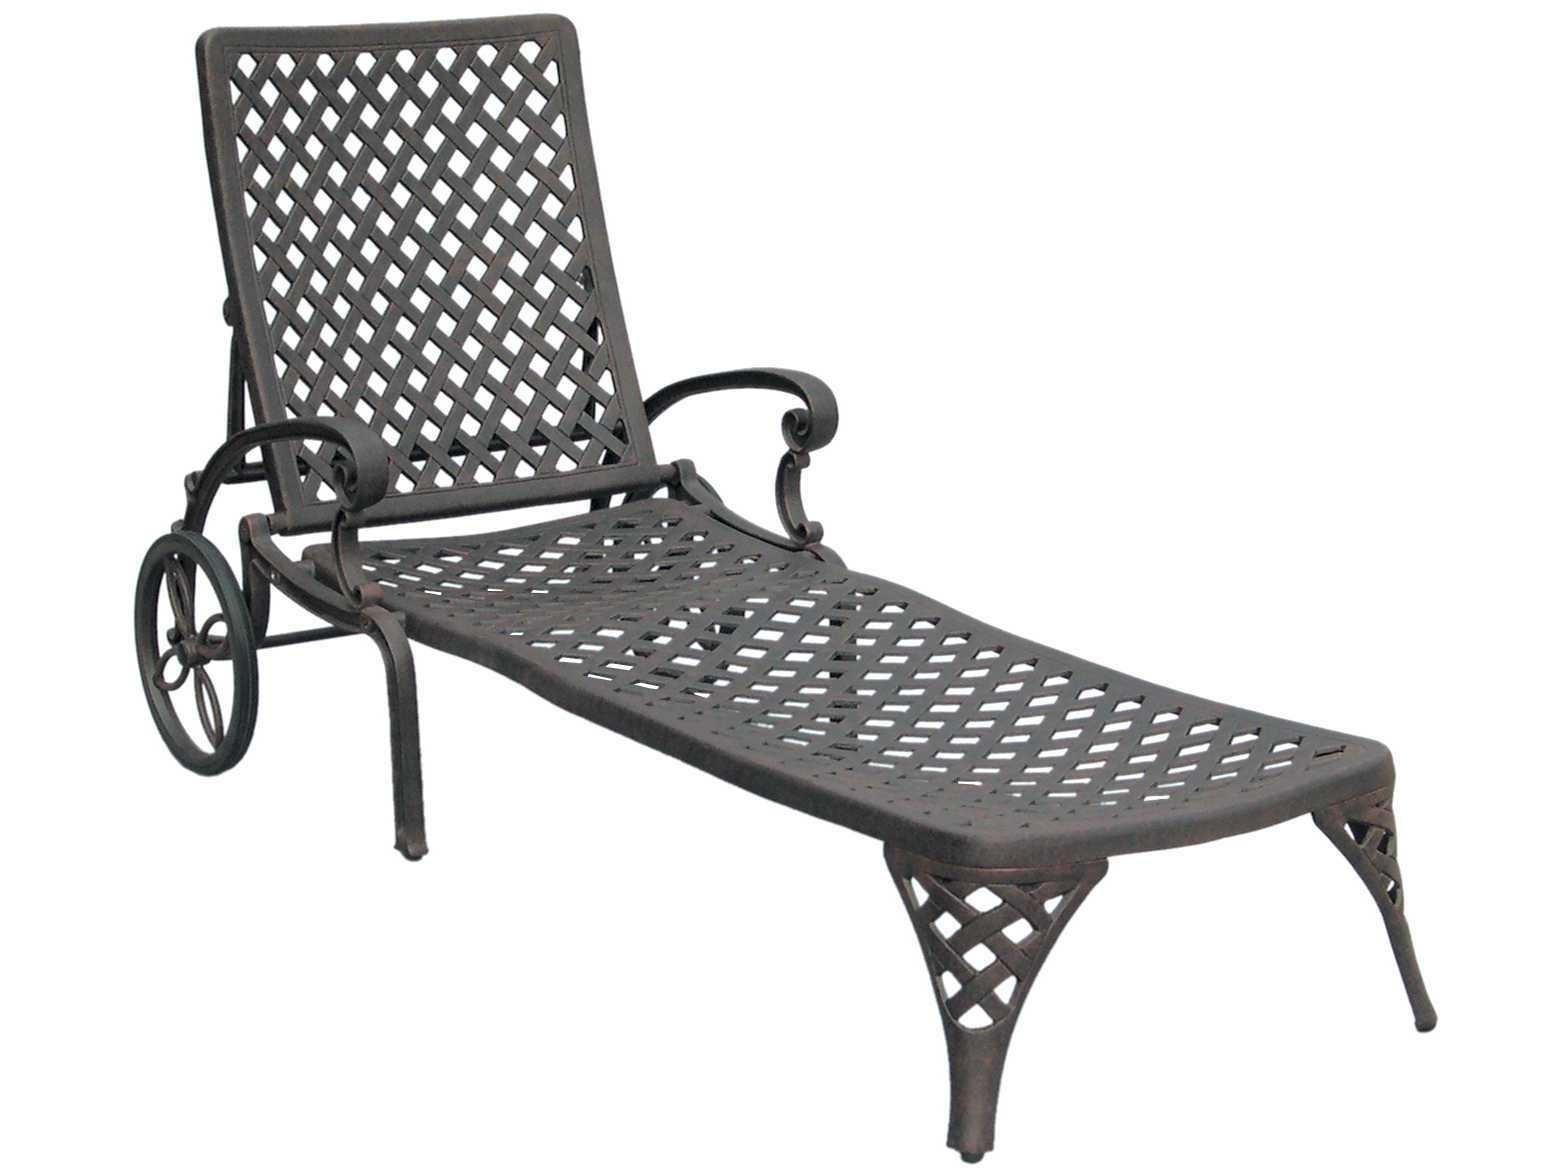 Outdoor Cast Aluminum Chaise Lounge Chairs For Recent Darlee Outdoor Living Standard Nassau Cast Aluminum Antique Bronze (View 9 of 15)